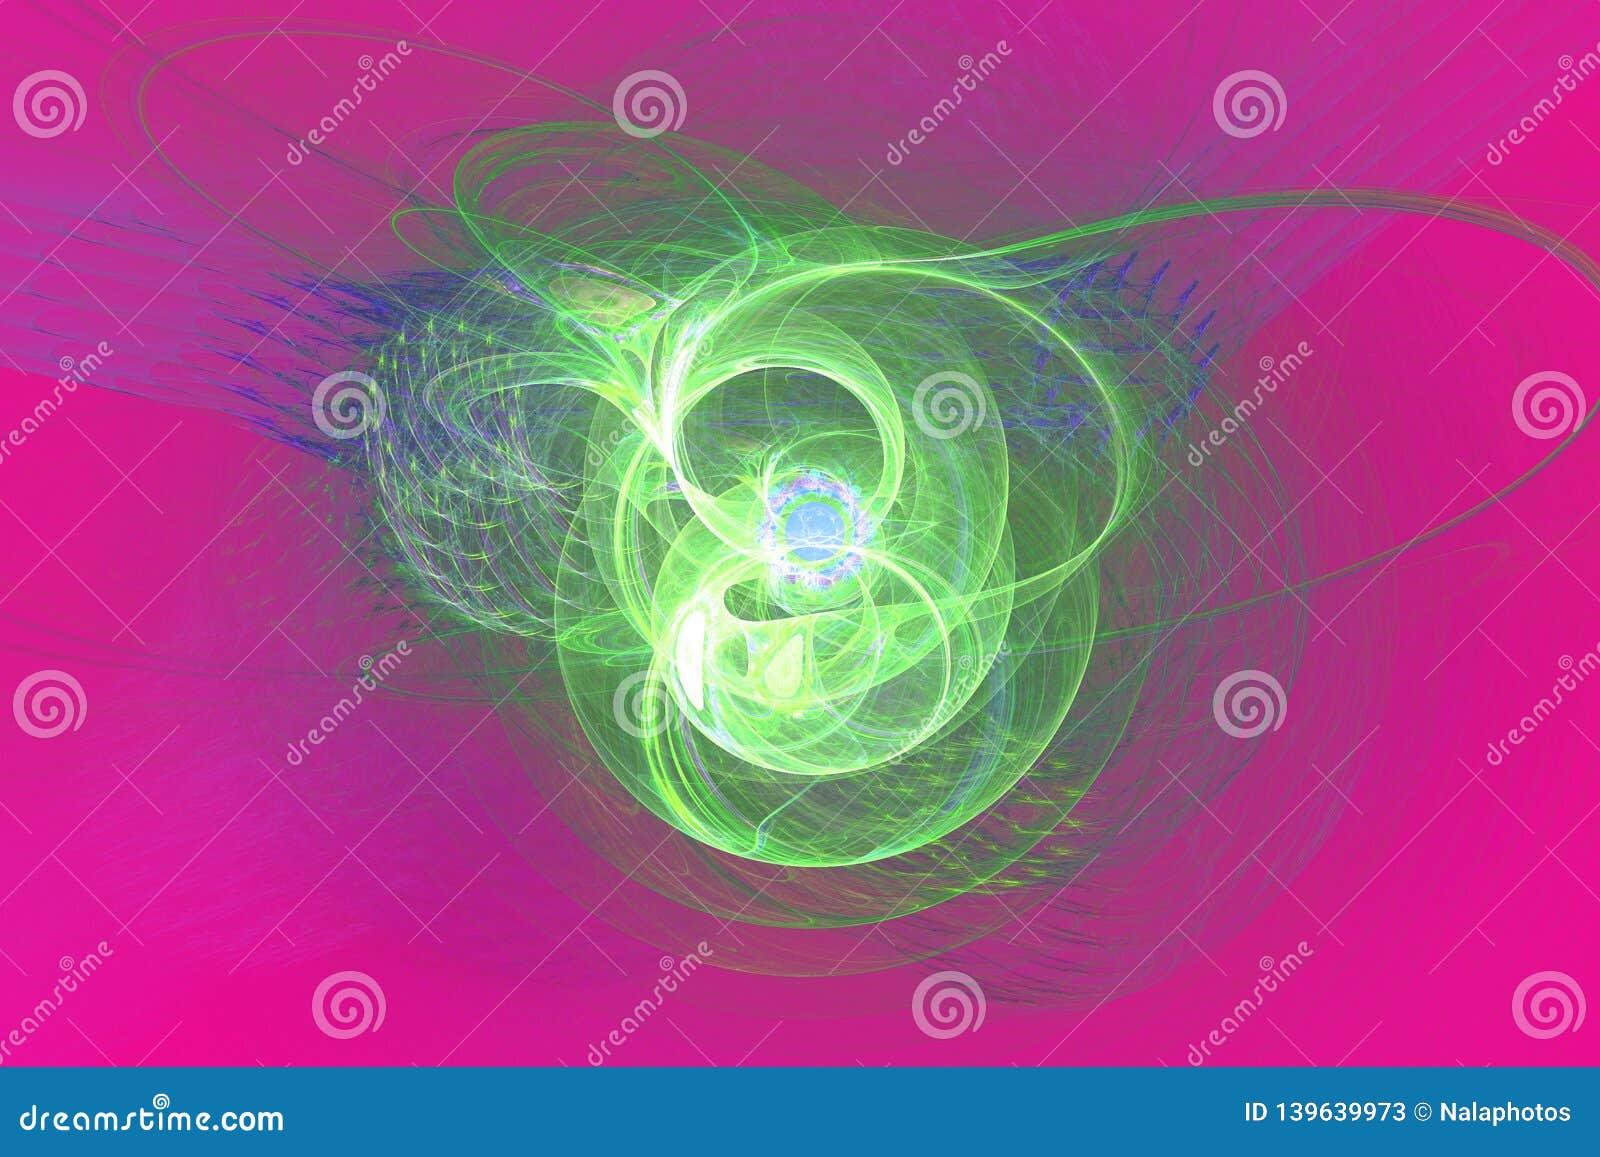 Fractal Fraktal οι μαύρες και ζωηρόχρωμες γεωμετρικές μορφές ταπετσαριών επεξηγούν το διαστημικό γαλαξία έκρηξης συχνότητας κόσμο